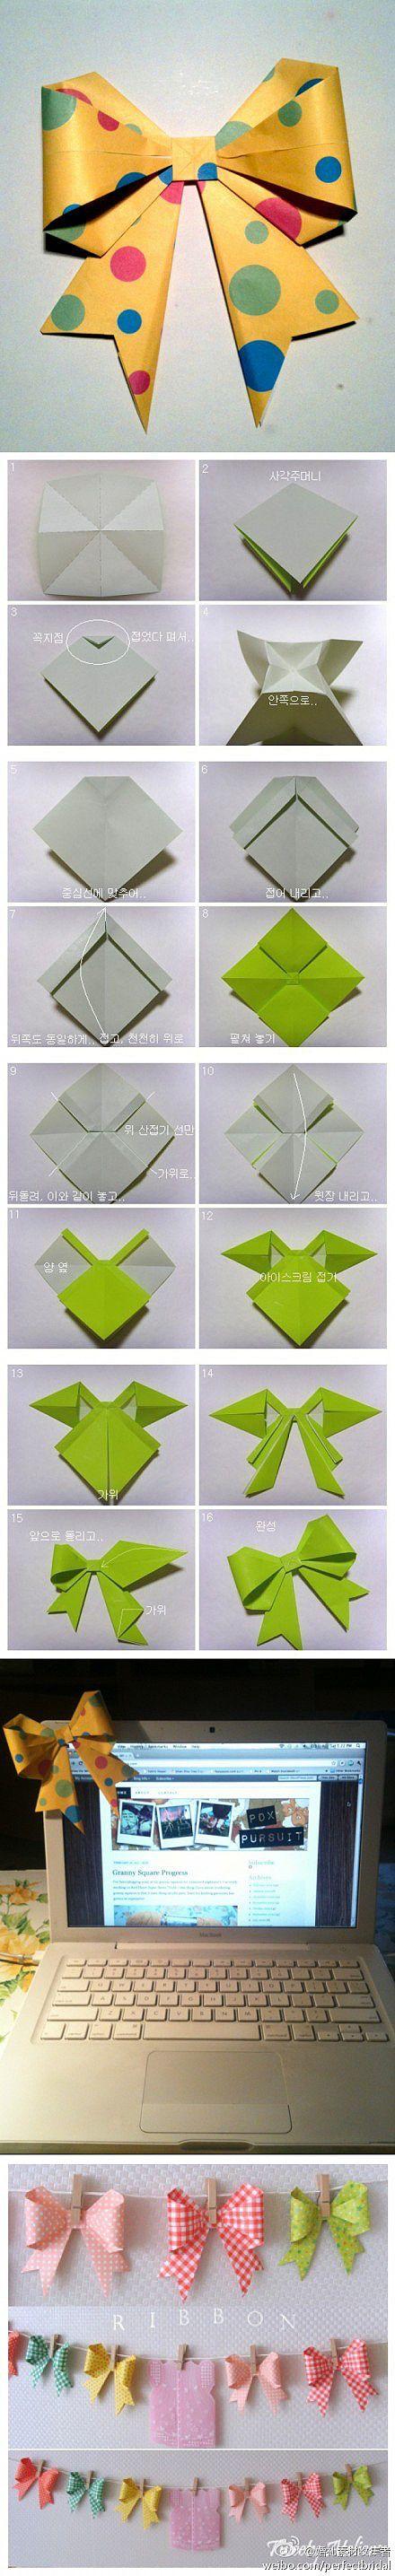 DIY paper bow/ Origami